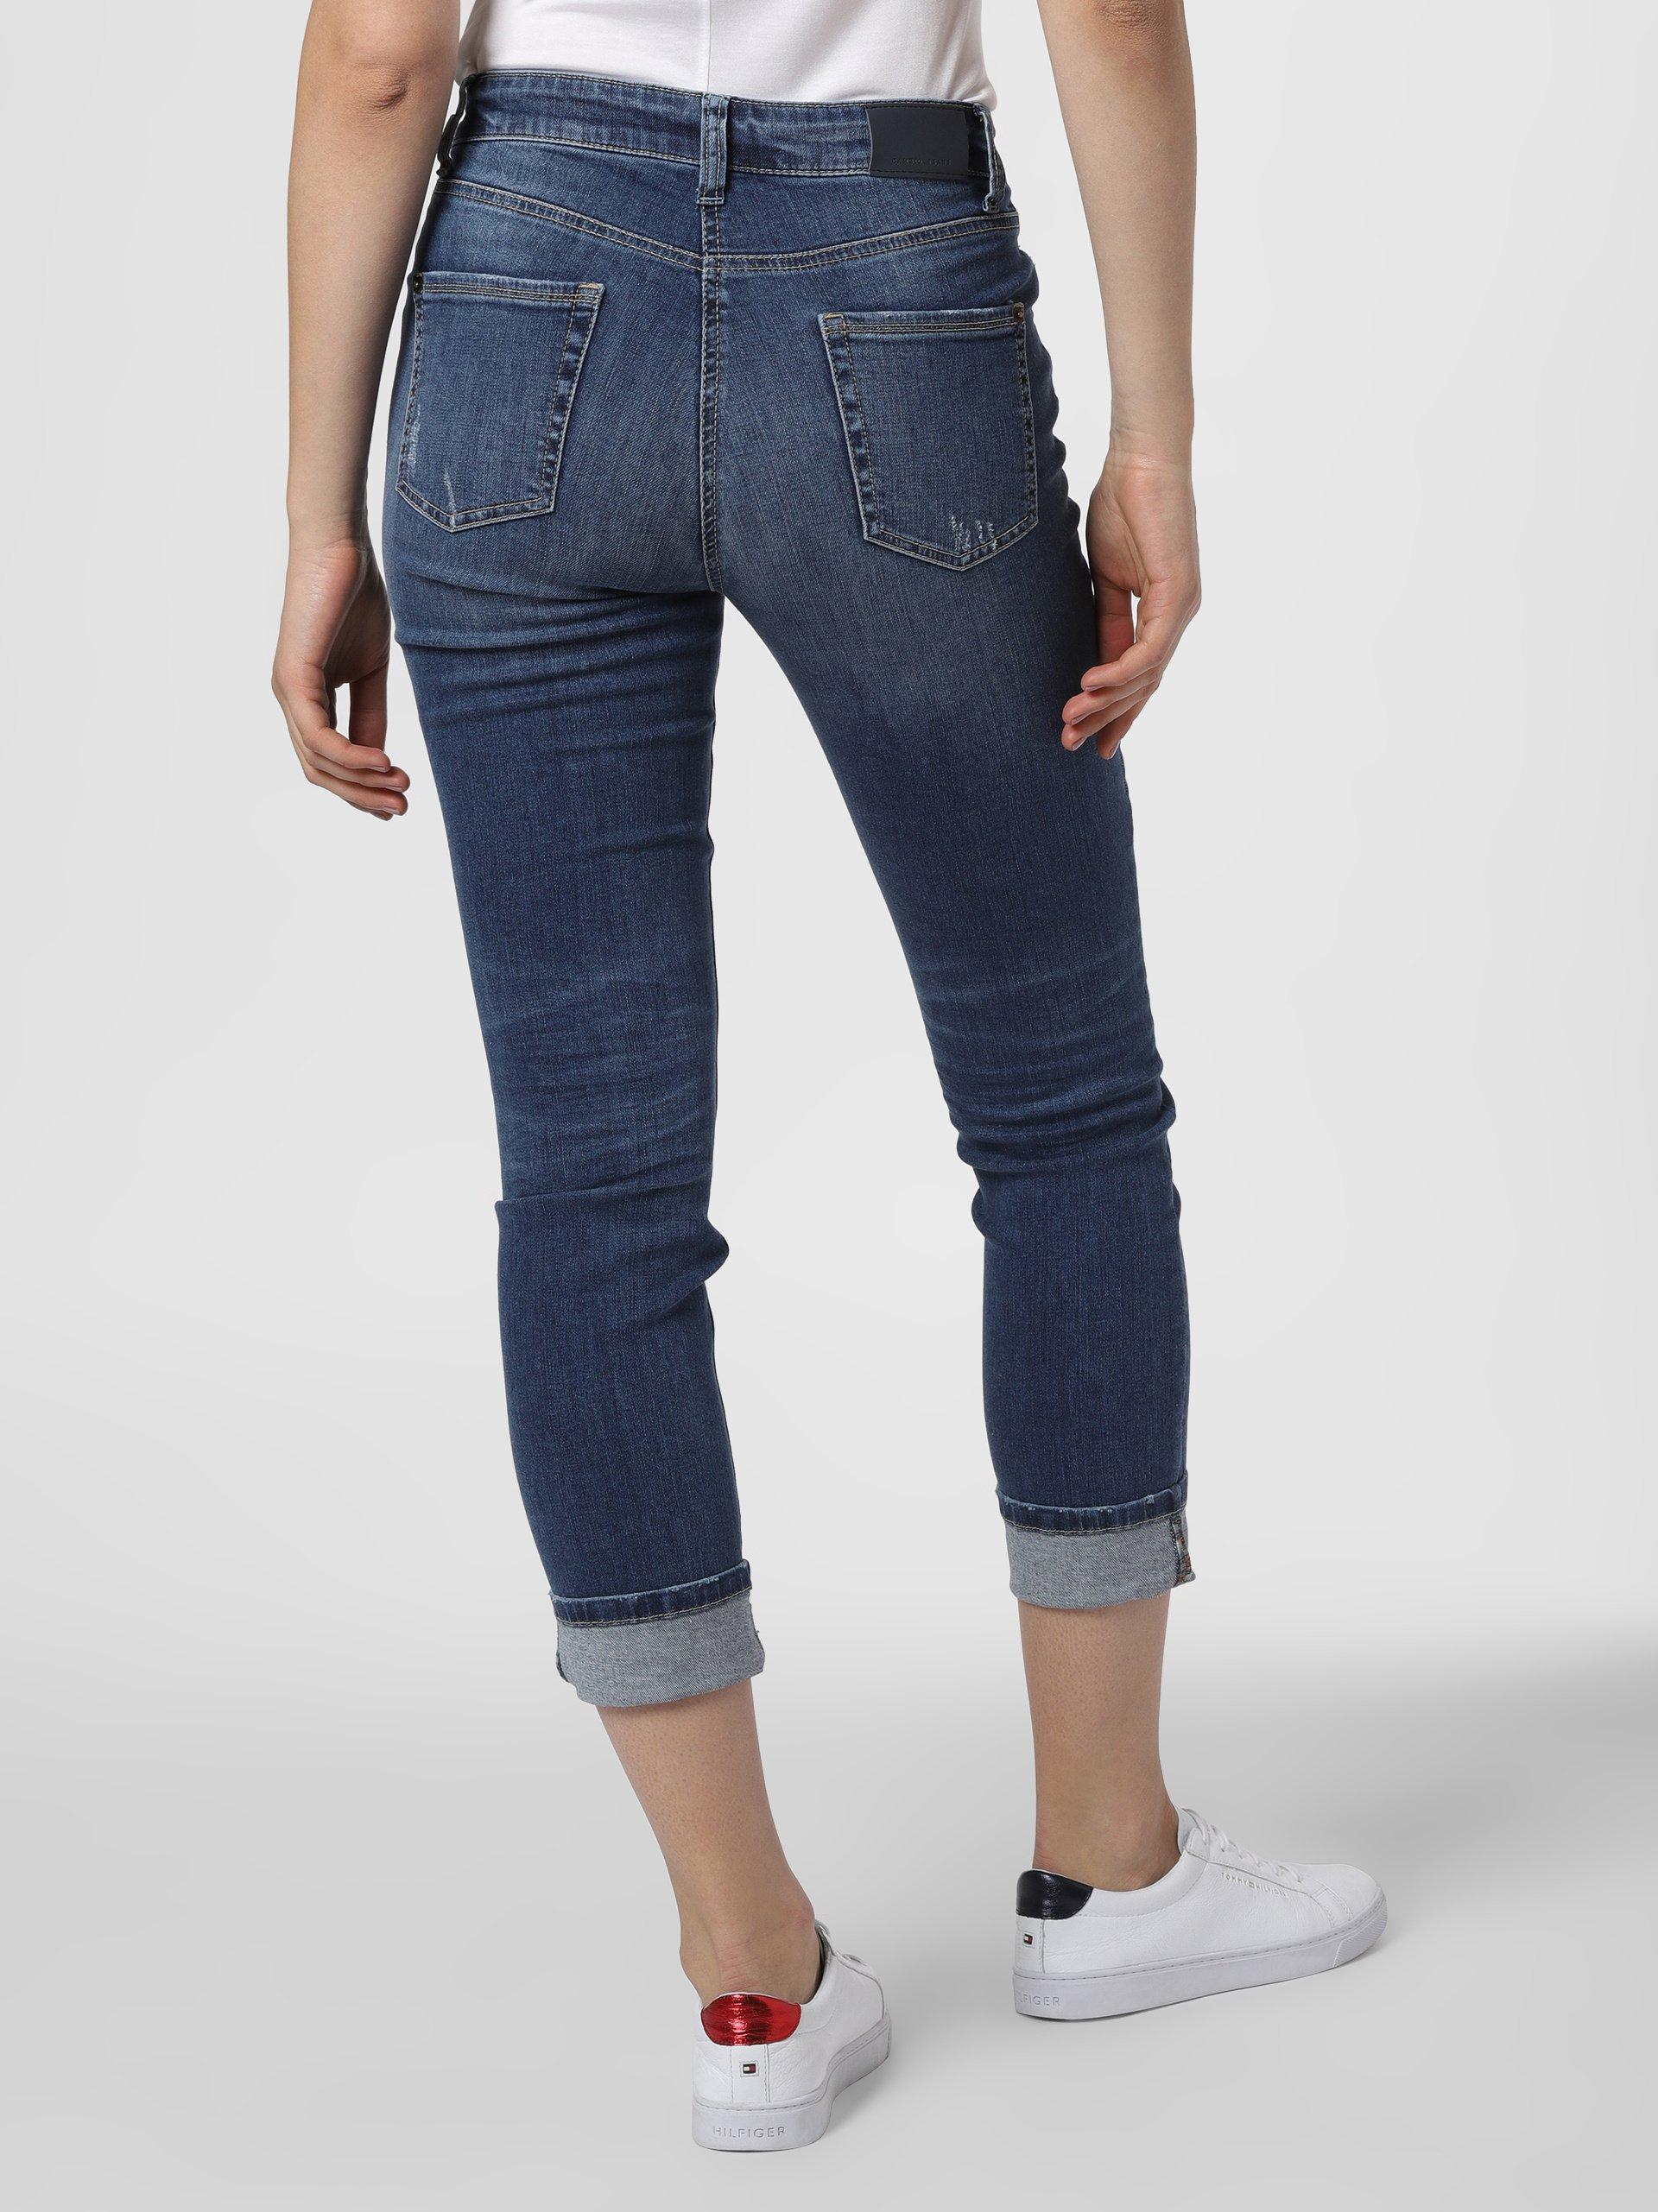 Cambio Damen Jeans - Pina Short